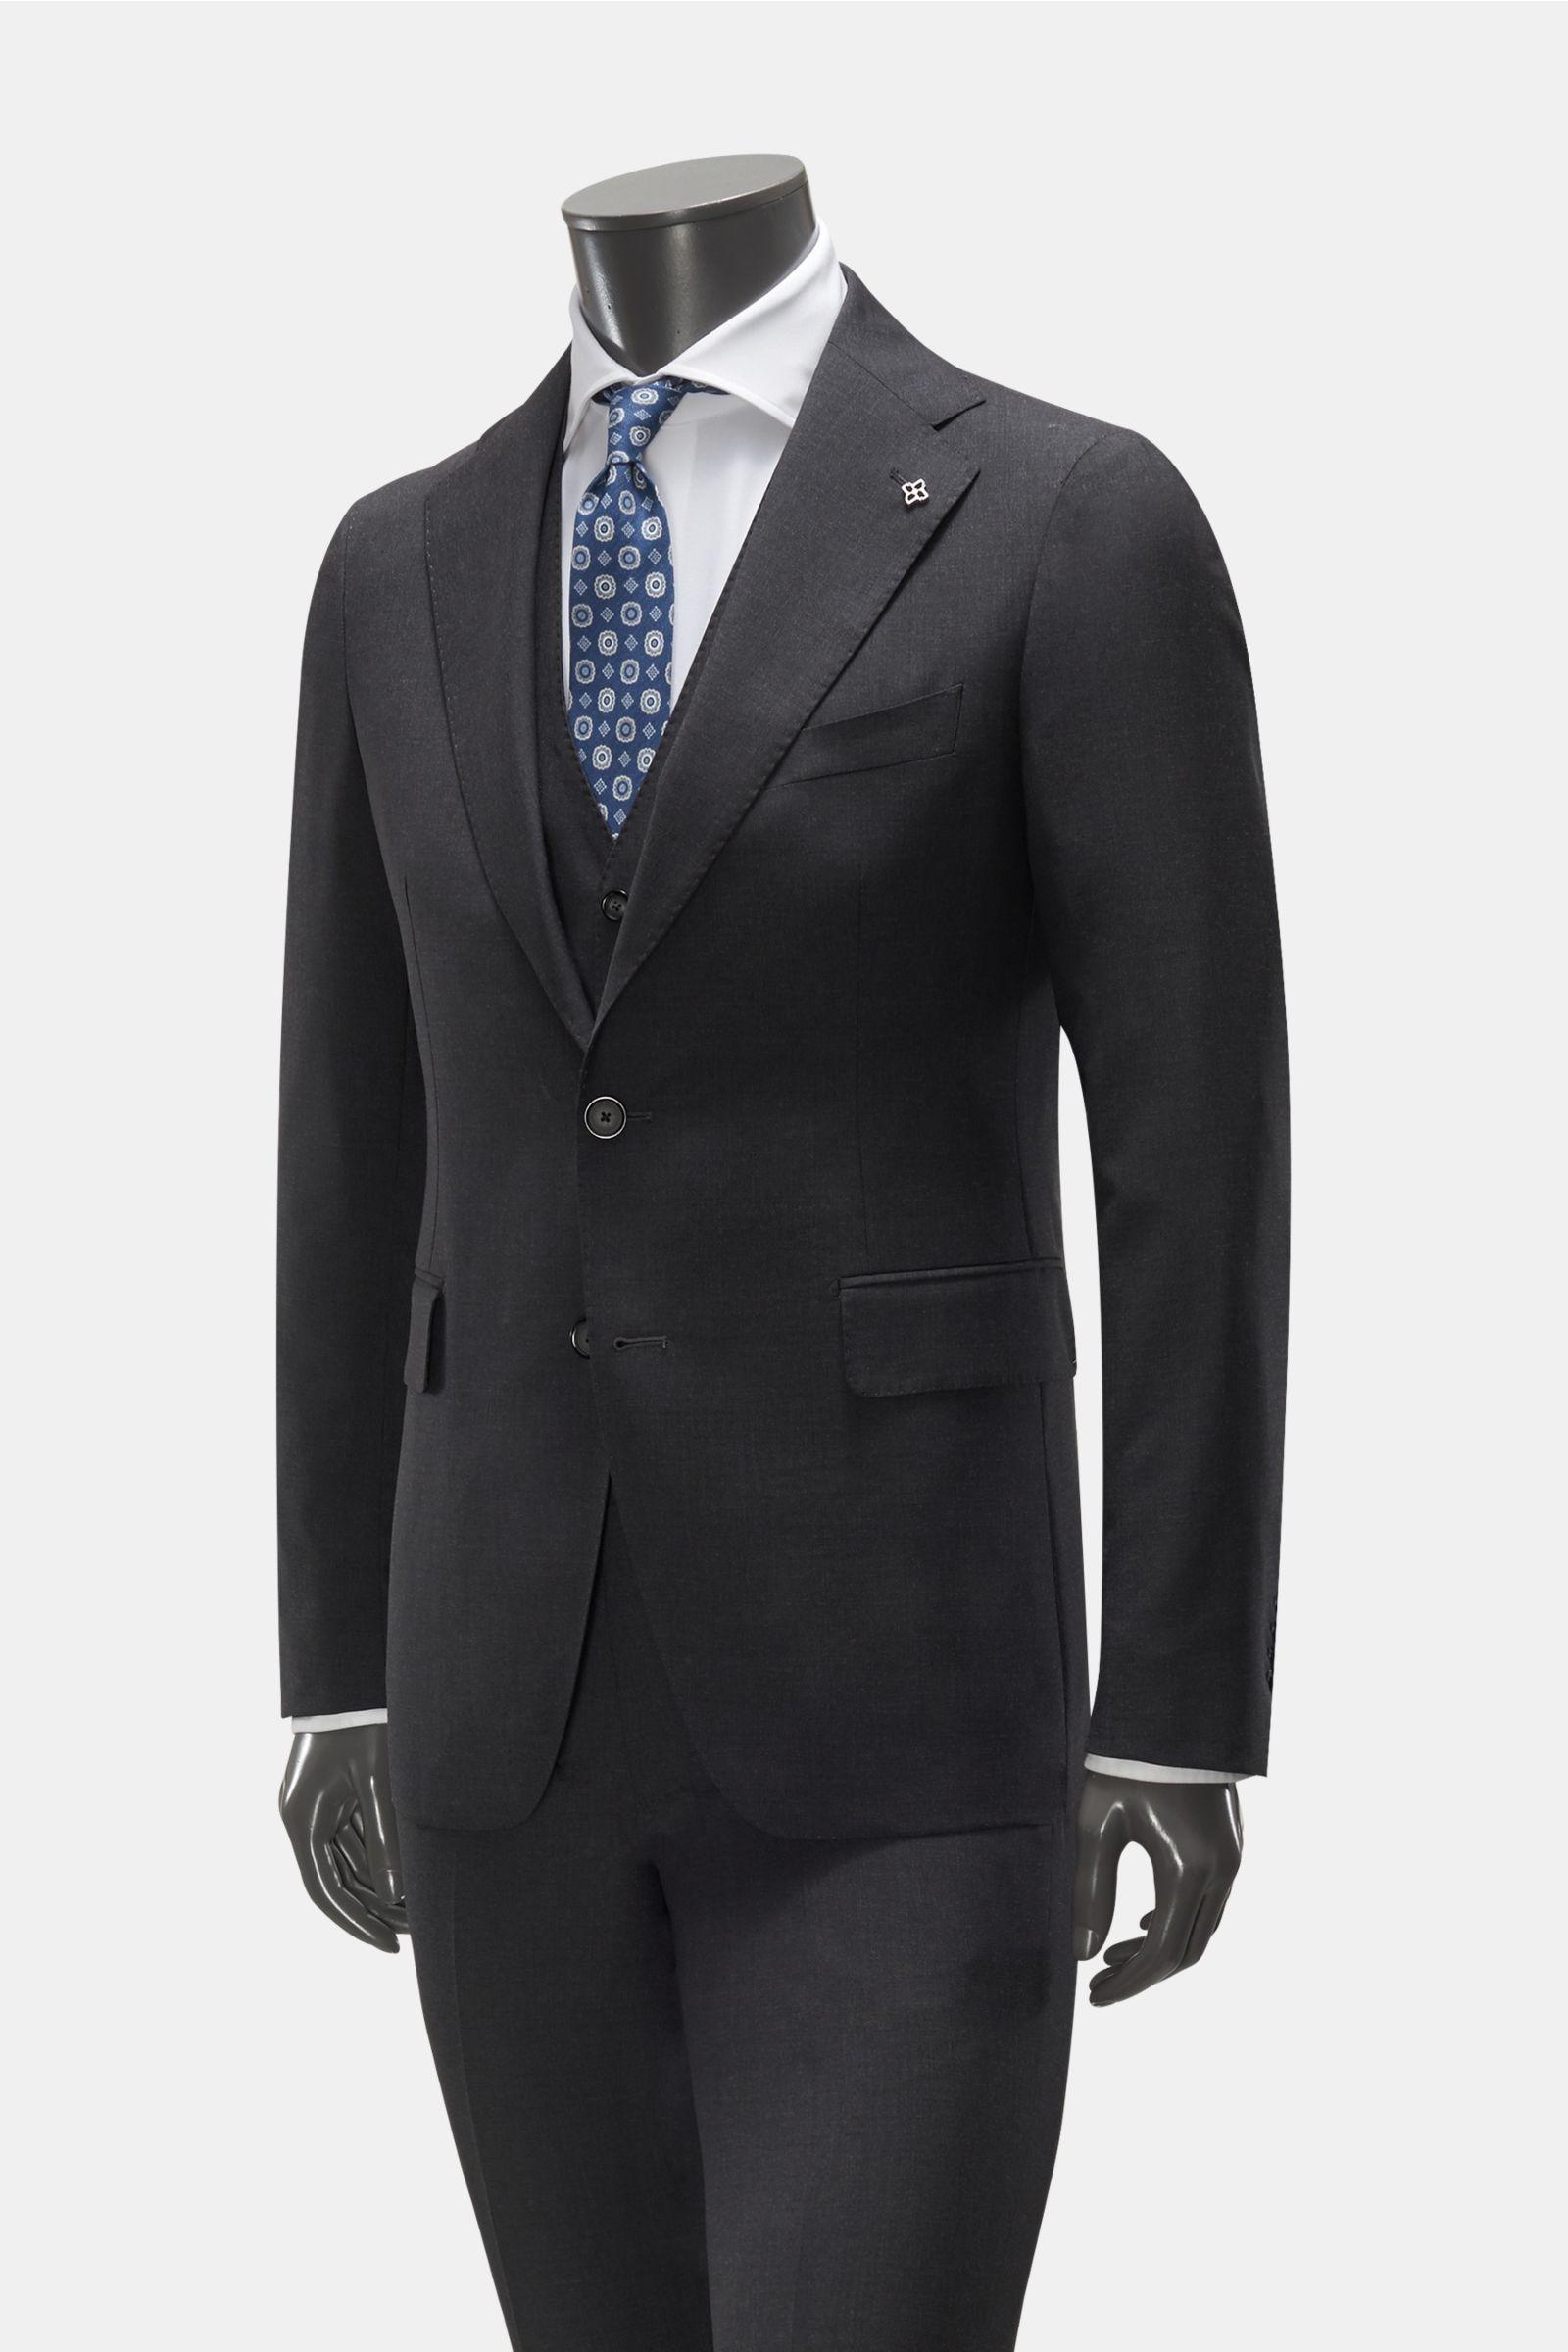 Anzug mit Weste dunkelgrau